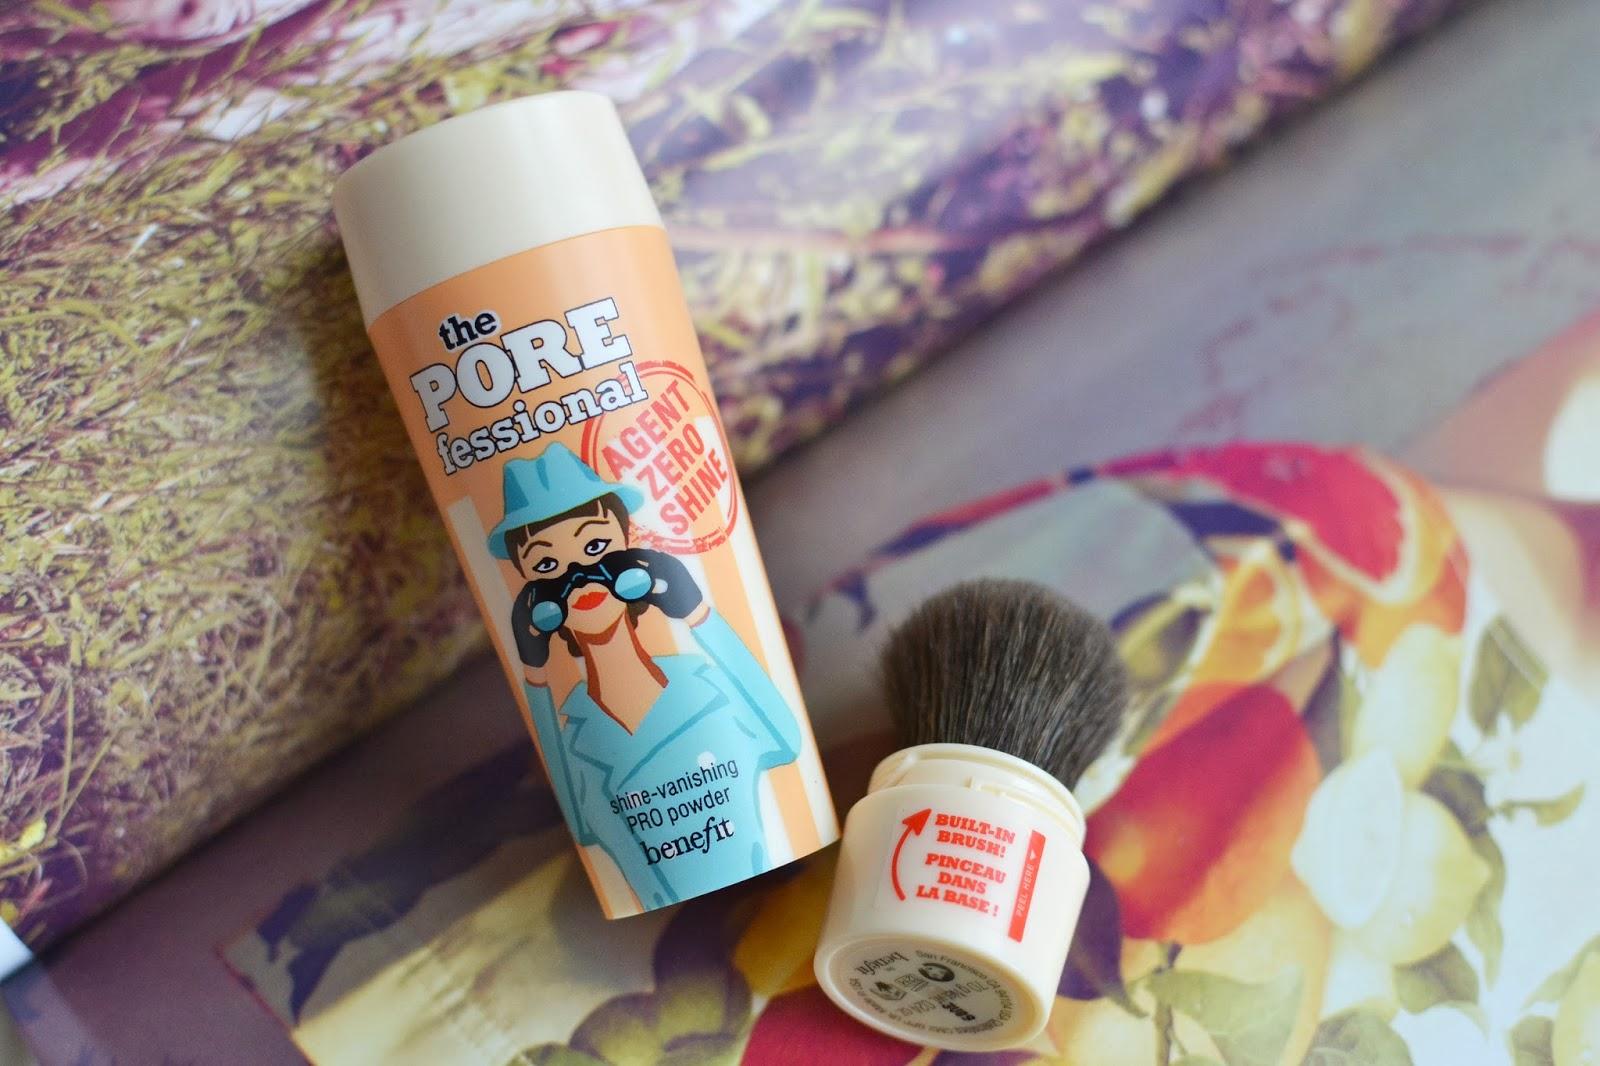 Benefit Porefessional Agent Zero Shine minimizes pores